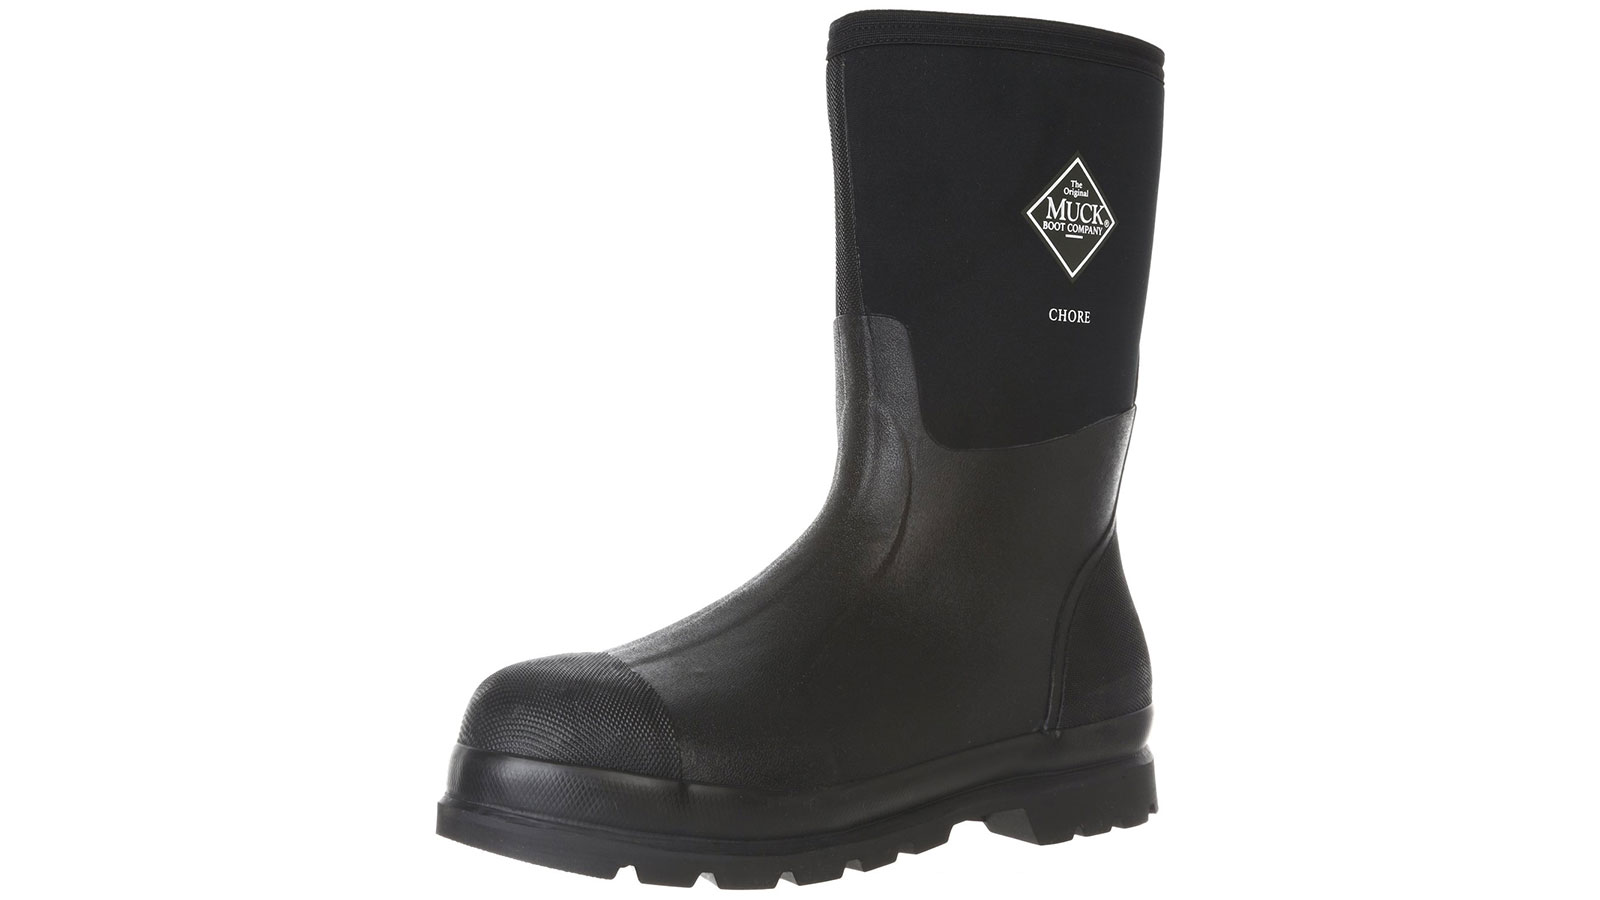 The Original MuckBoots Adult Chore Mid Men's Rain Boot | the best men's rain boots